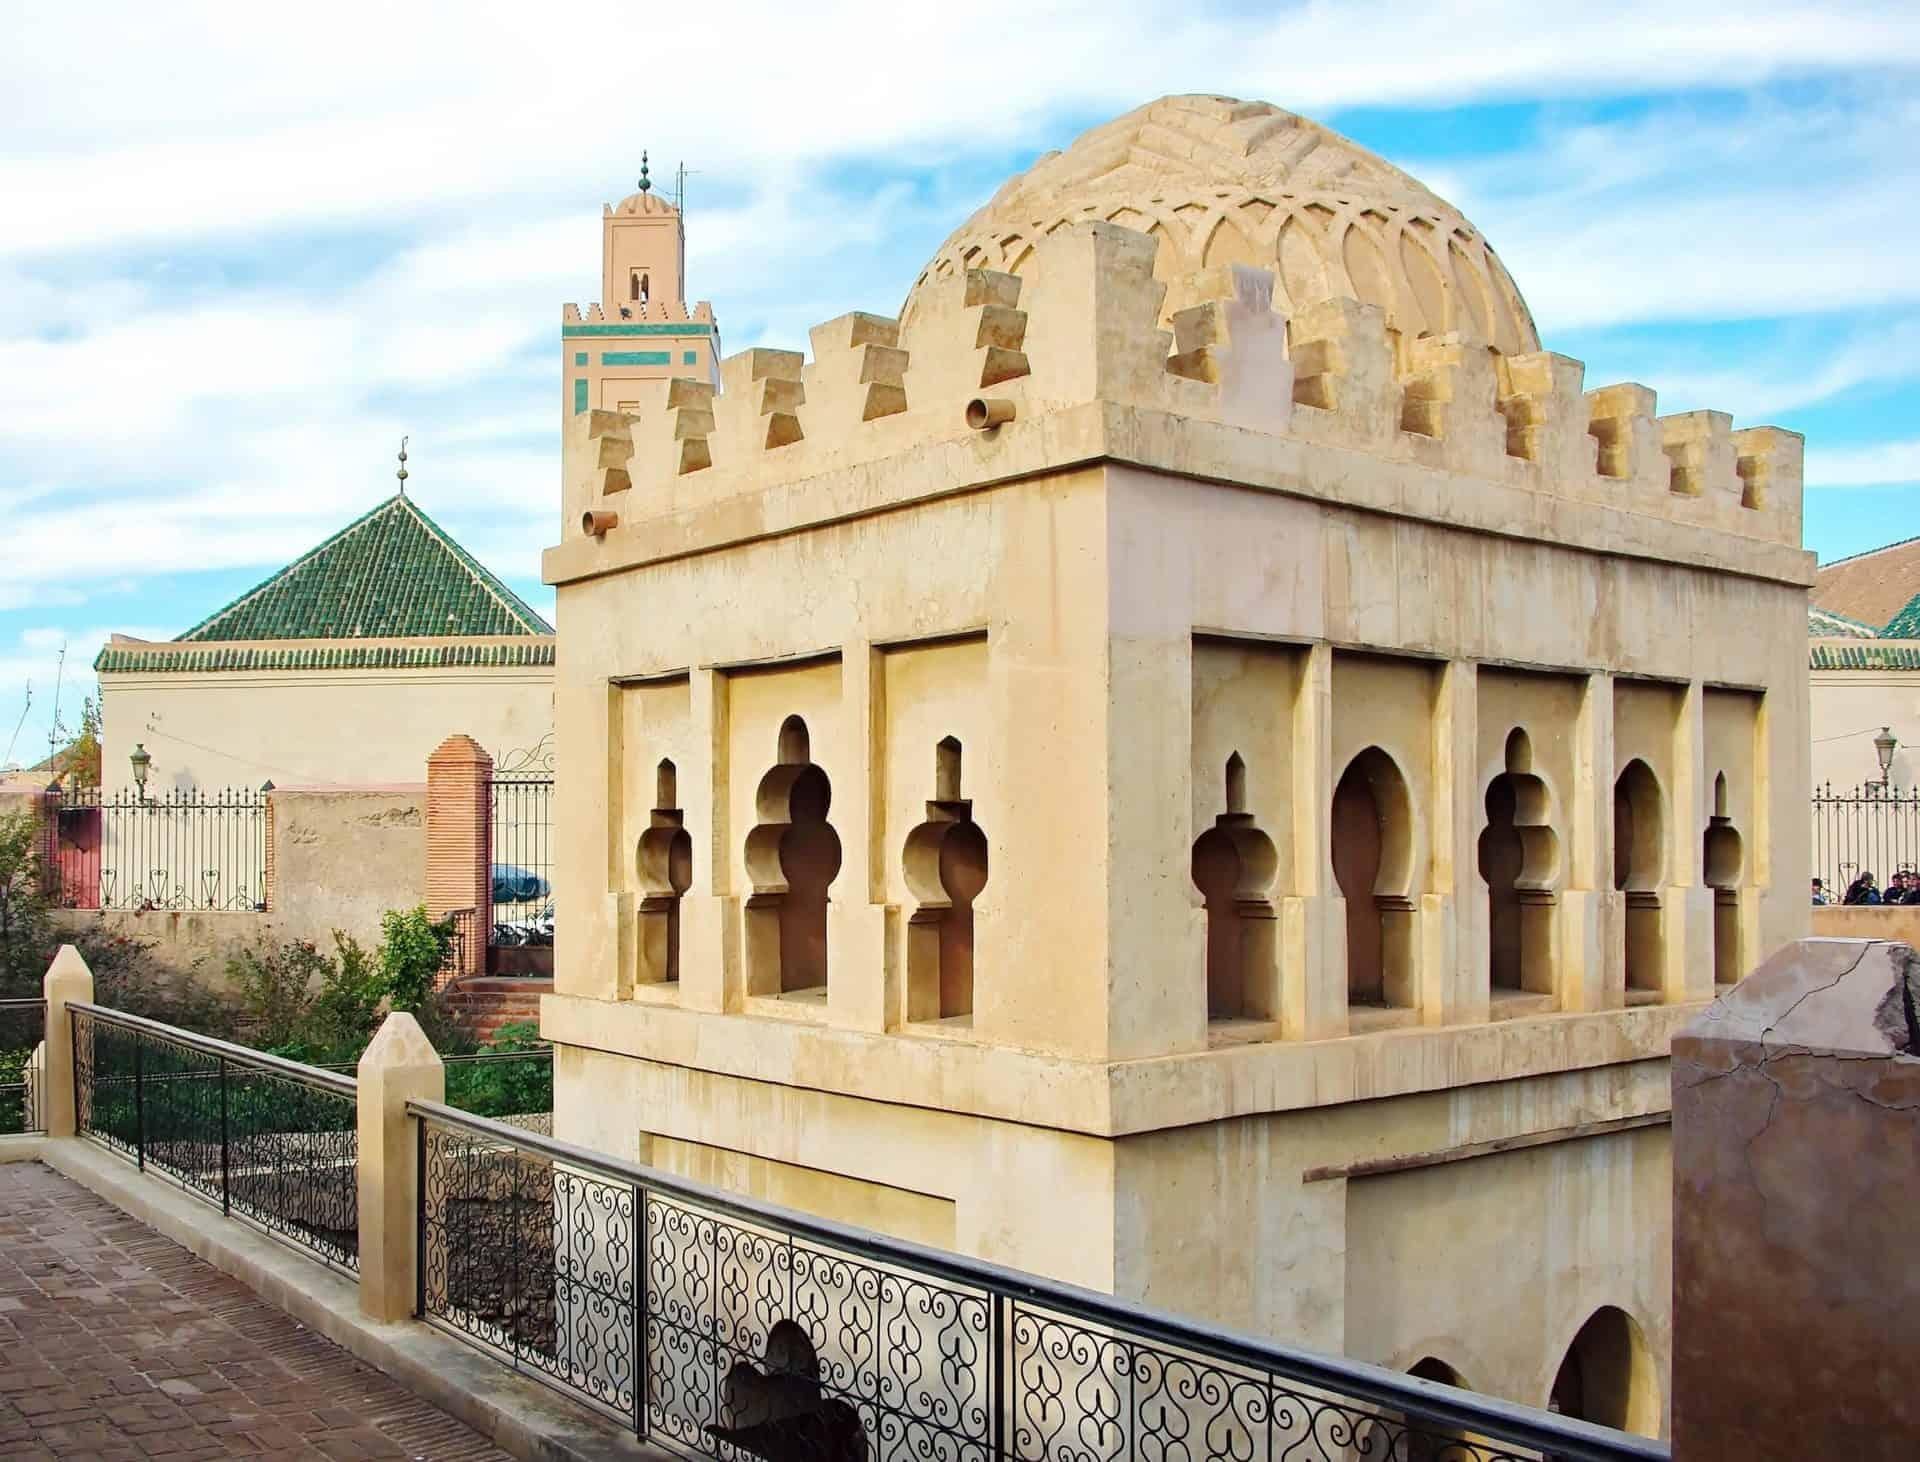 marrakeshsouksandscholars_4) Almoravid Koubba (Royalty Free, Pixabay.com)